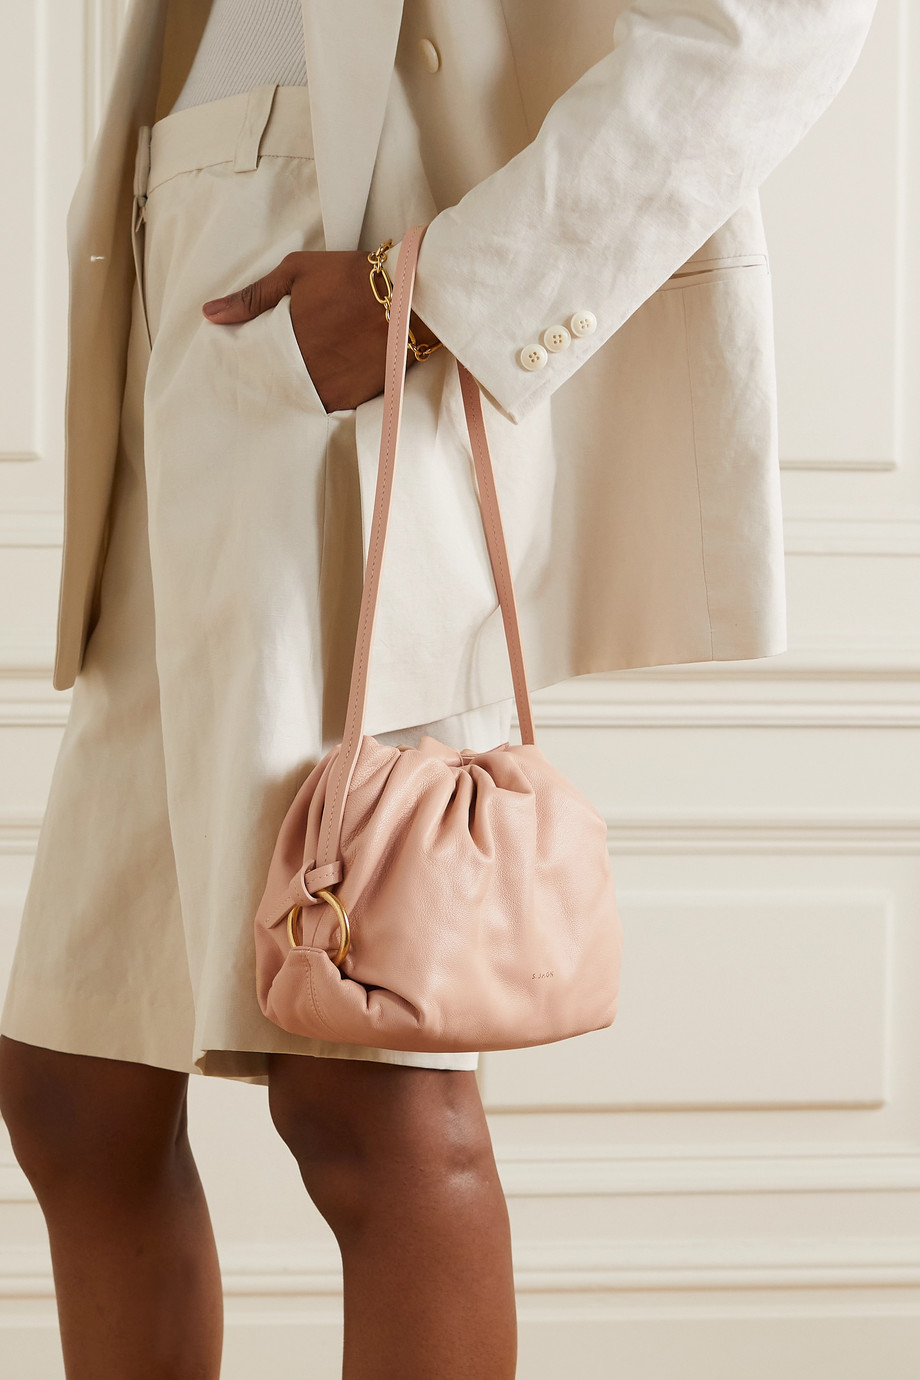 S.Joon Baby Bao gathered leather shoulder bag